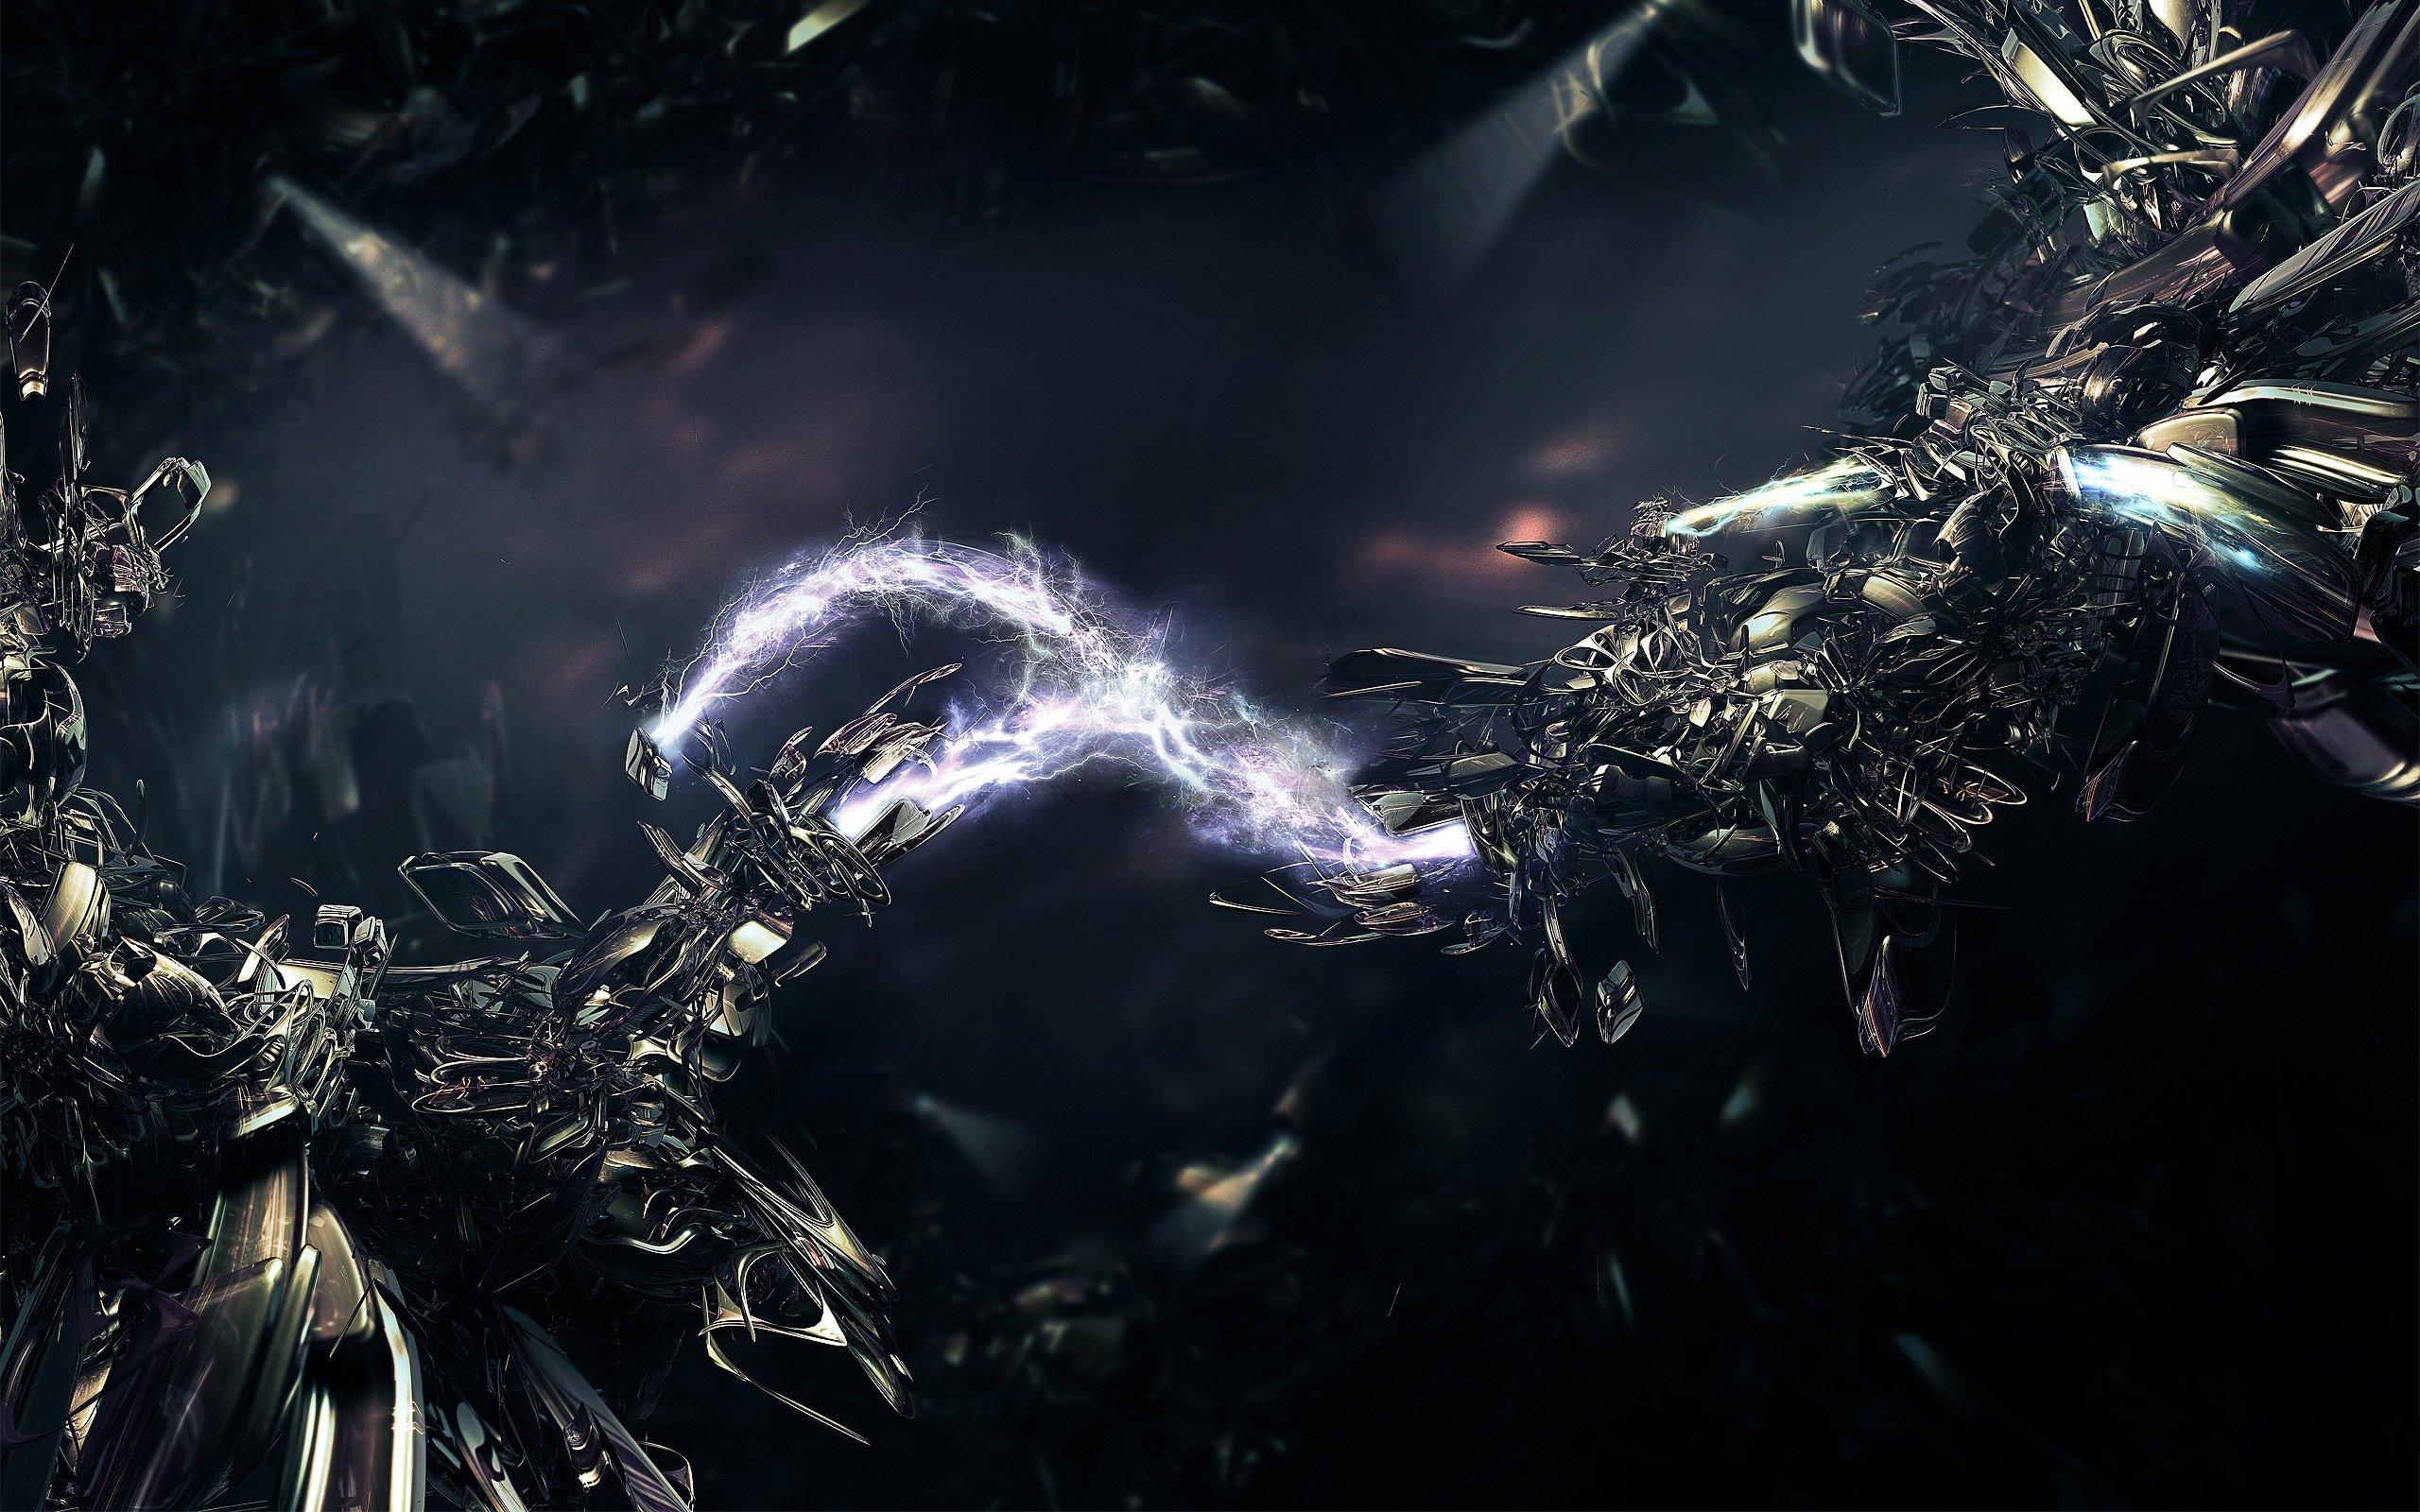 CGI - Fantasy  Wallpaper